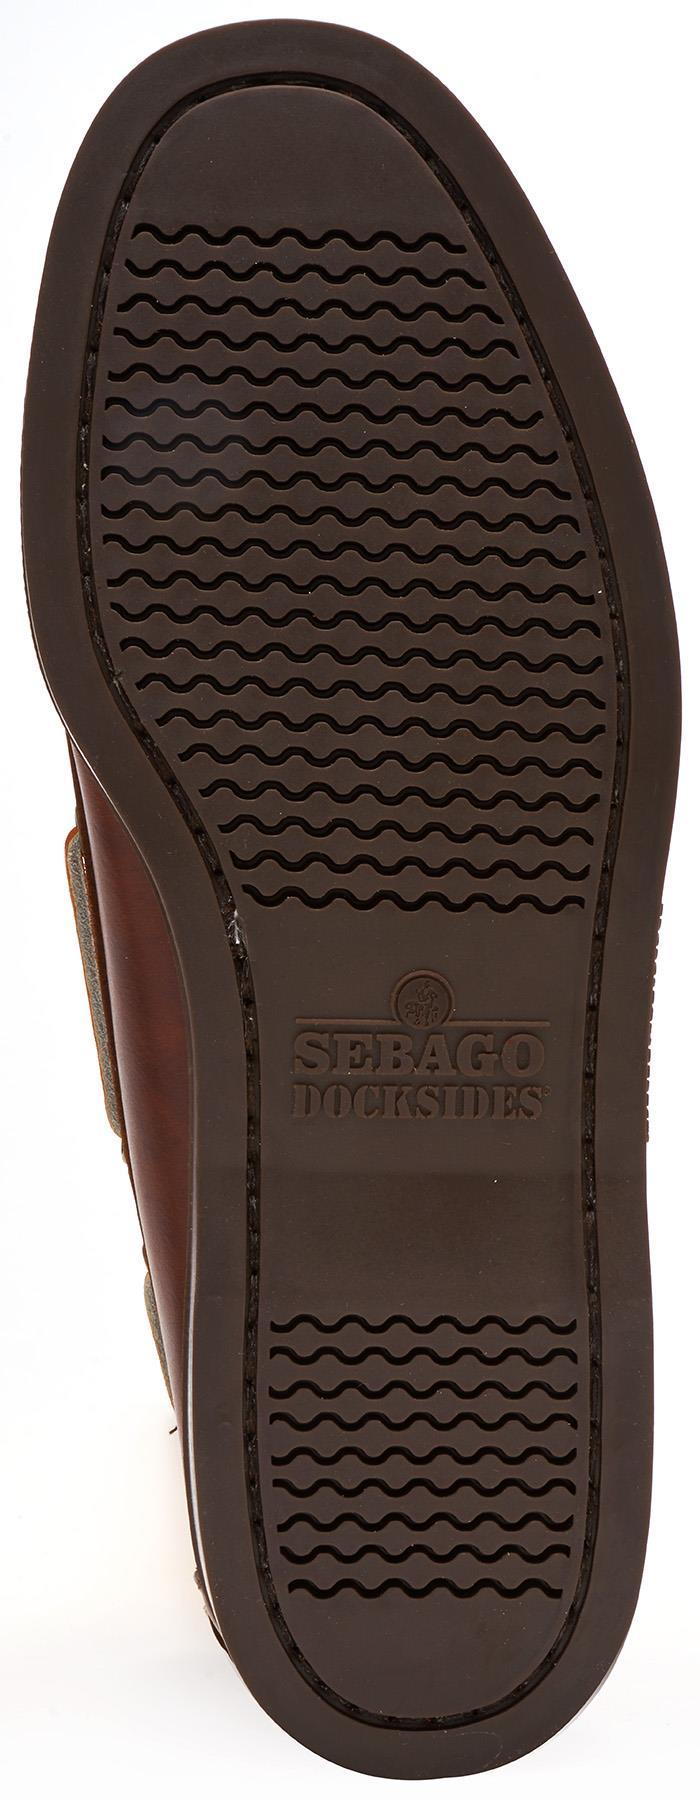 Sebago-Docksides-NBK-Suede-Boat-Deck-Shoes-in-Navy-Blue-amp-Coral-amp-Dark-Brown thumbnail 13